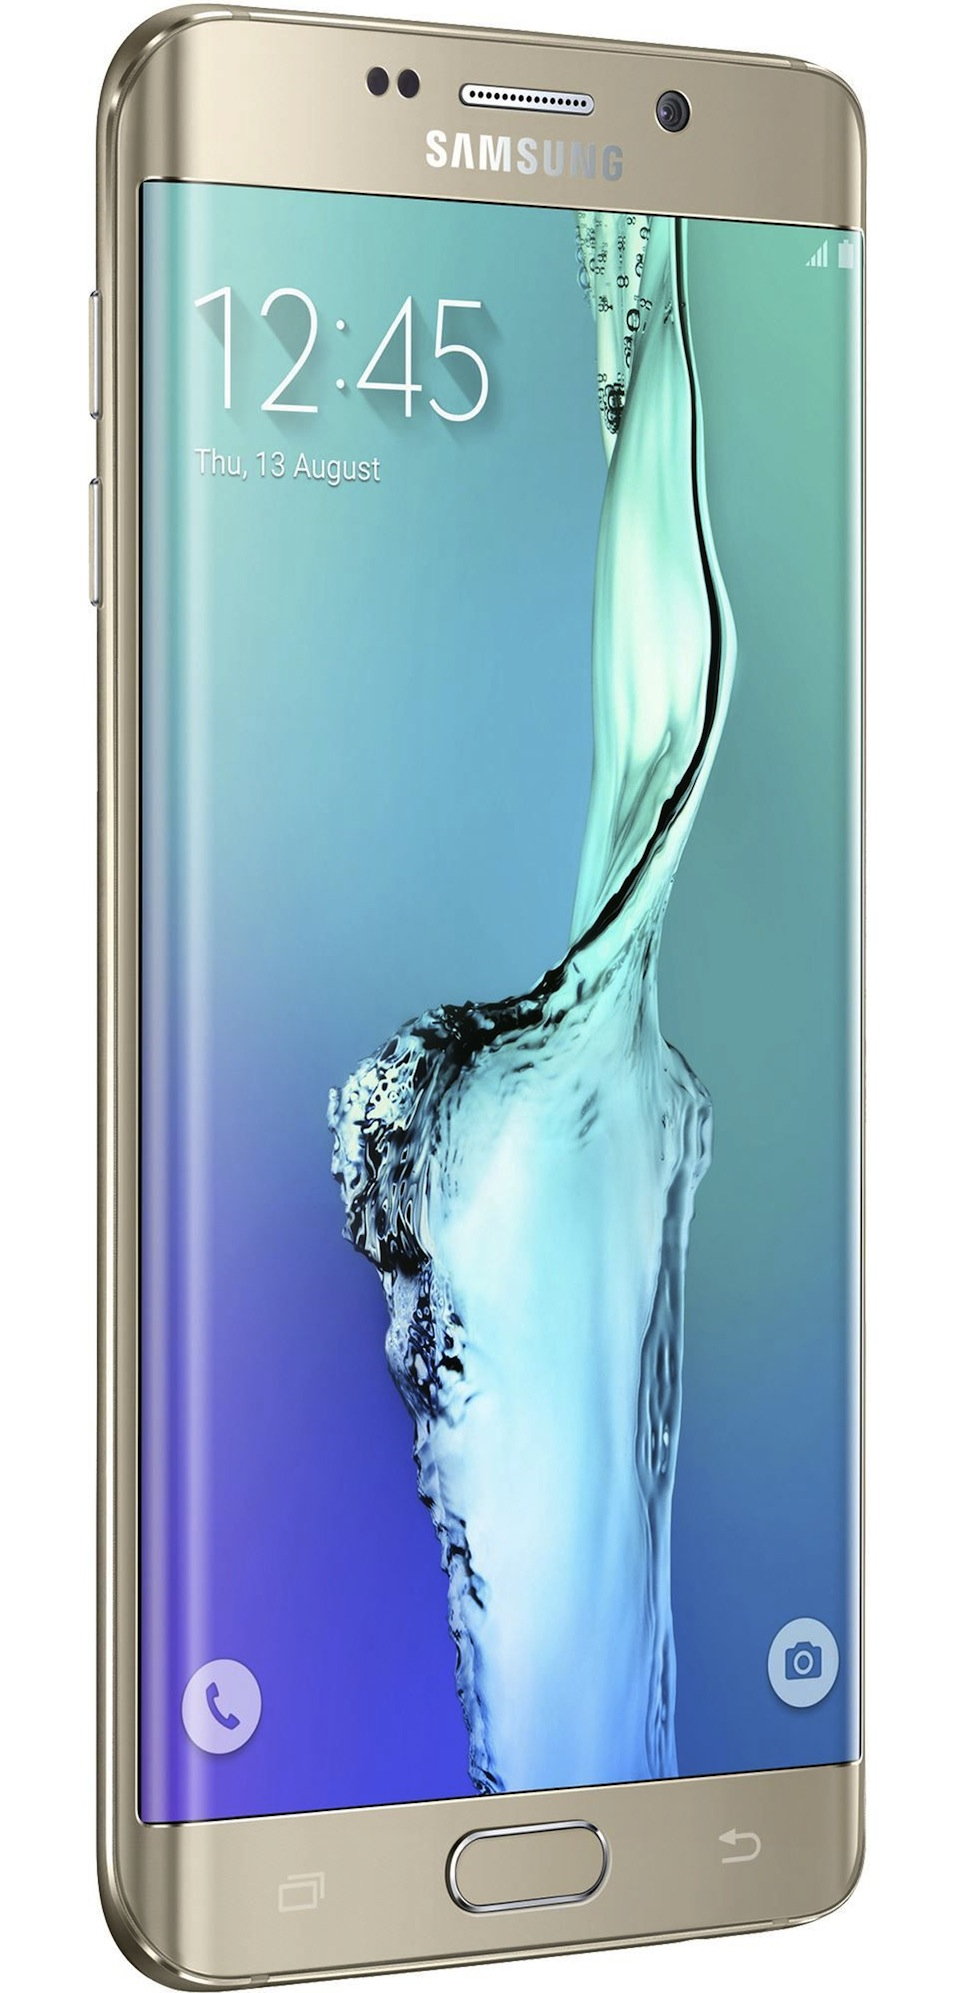 Cadou de Craciun Telefon mobil Samsung G928 GALAXY S6 Edge Plus Auriu